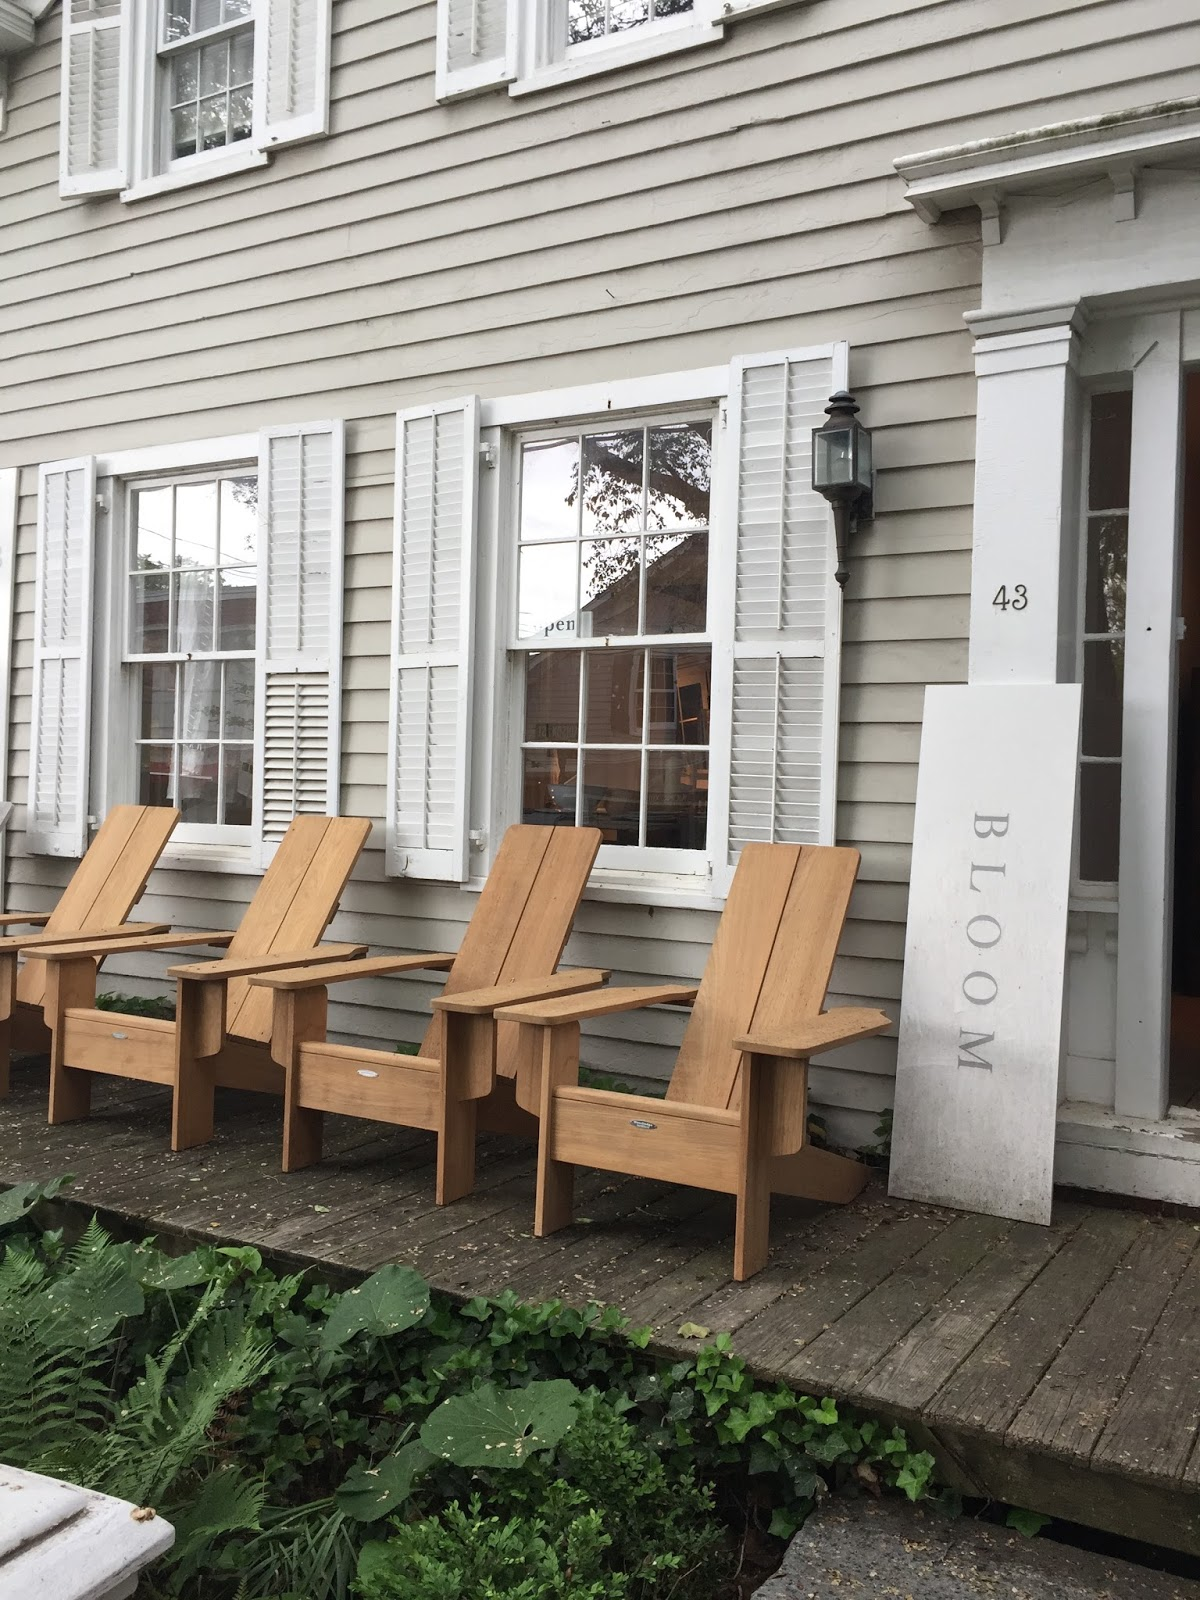 Sag Harbor House By P T Interiors With Images: LA DOLFINA: Favorite Sag Harbor Shop